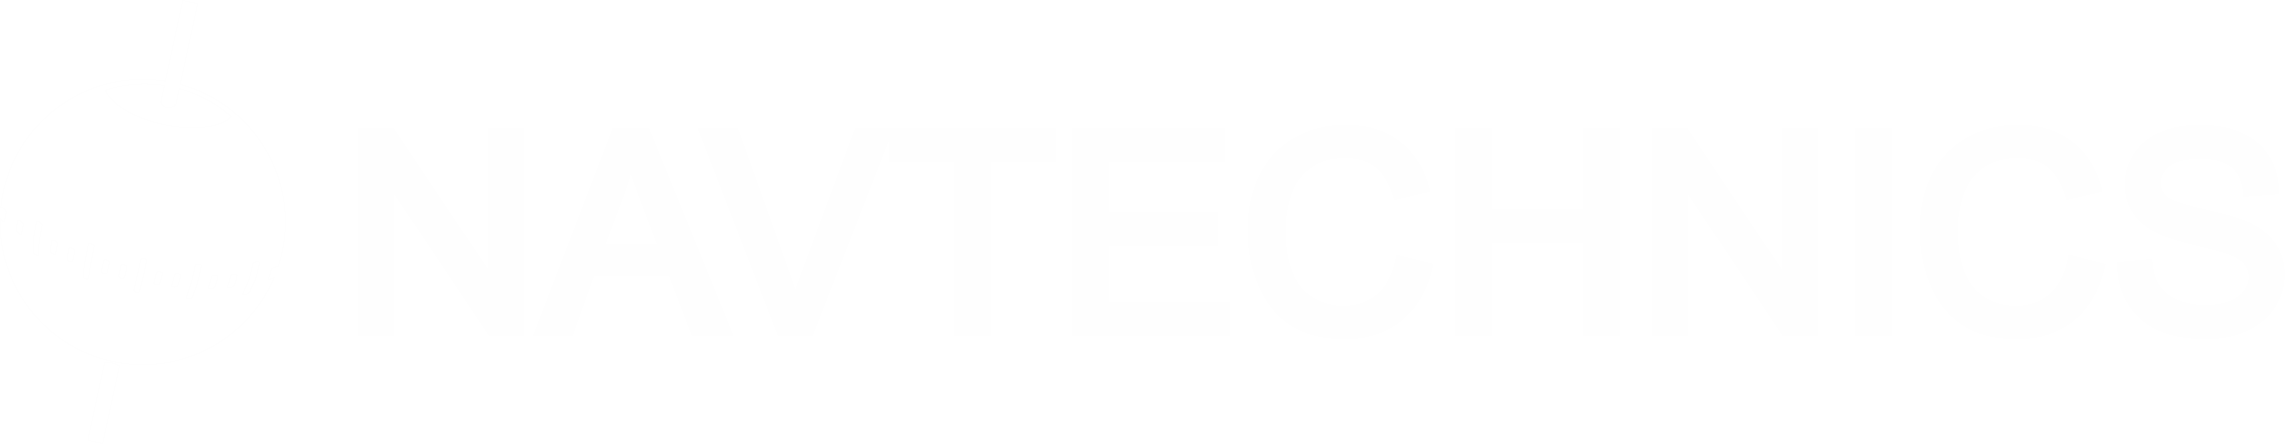 Navtechnics | Навтехника